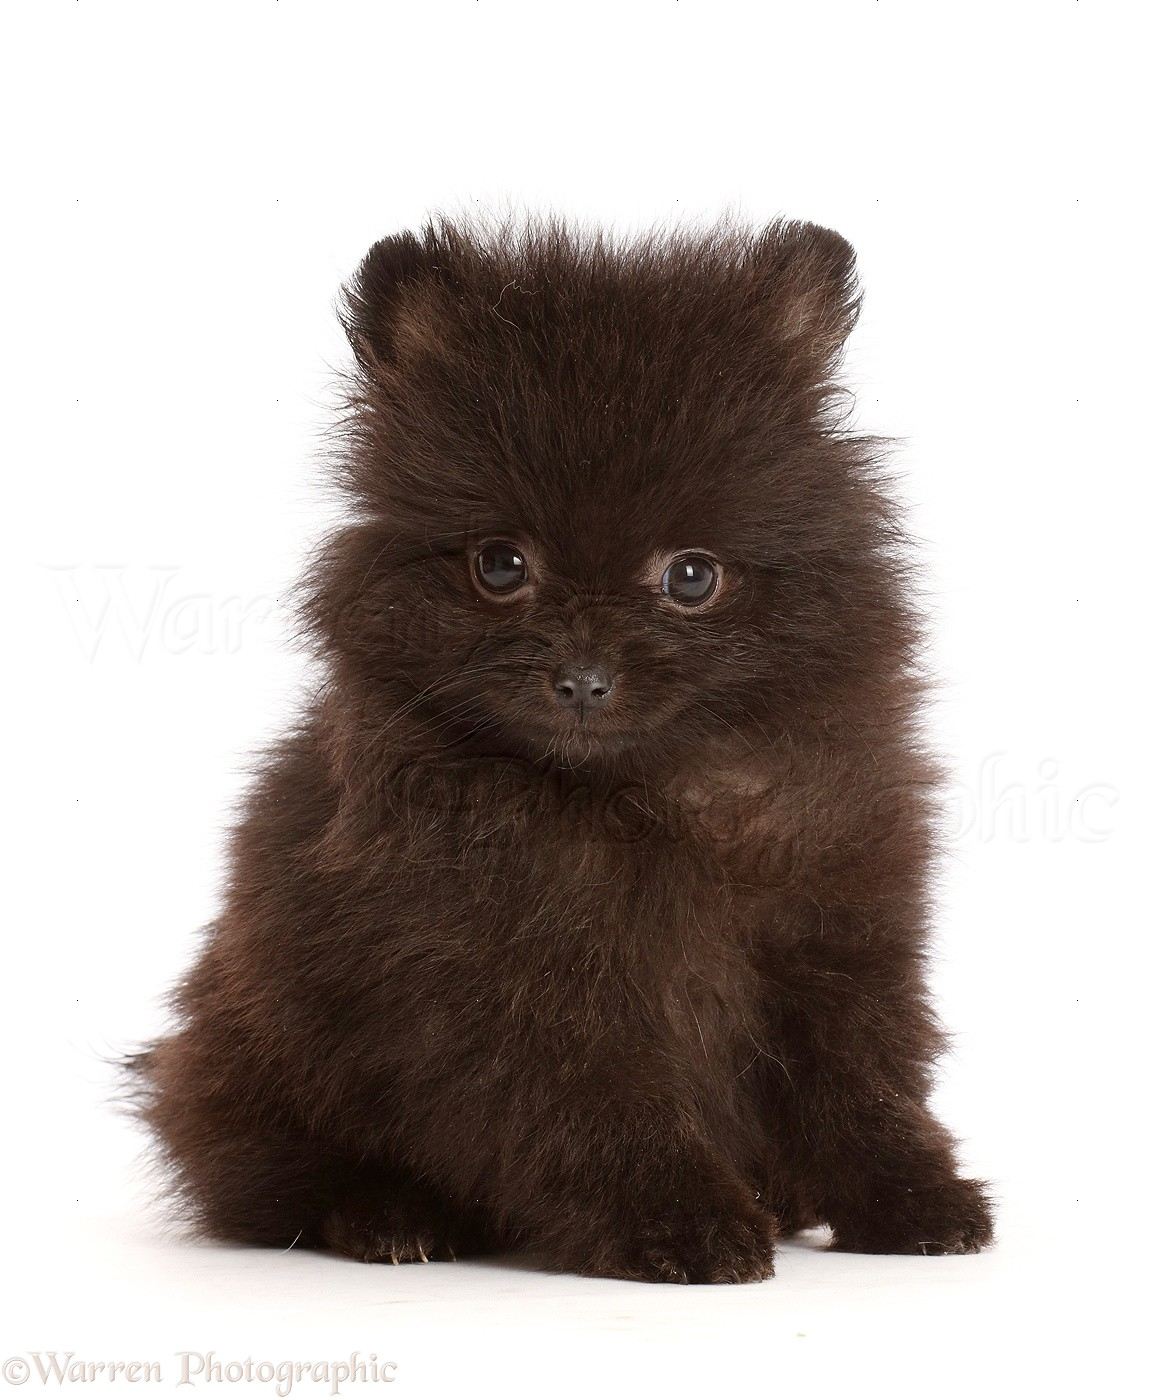 Dog Black Pomeranian Puppy Sitting Photo Wp47467